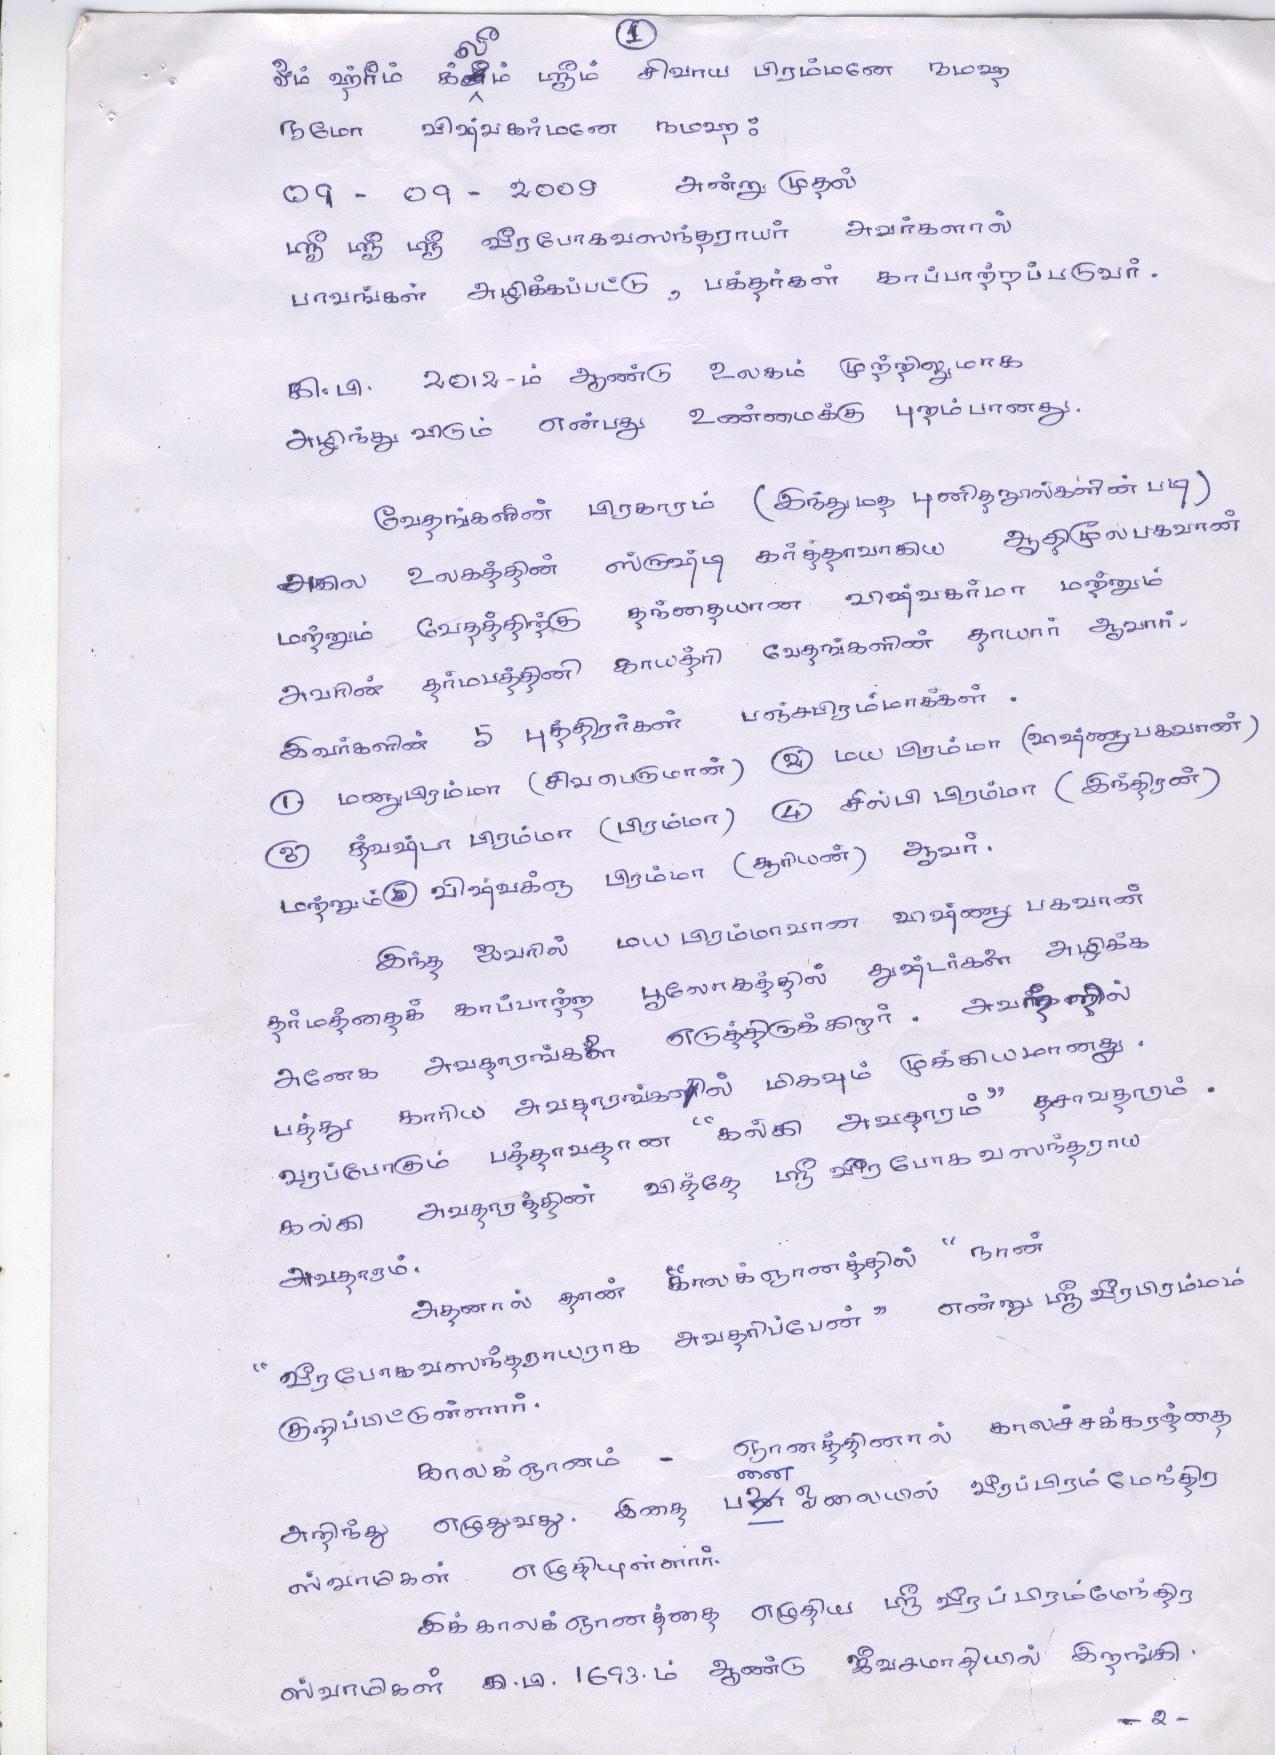 Sri potuluri veera brahmendra swamy movie songs free download